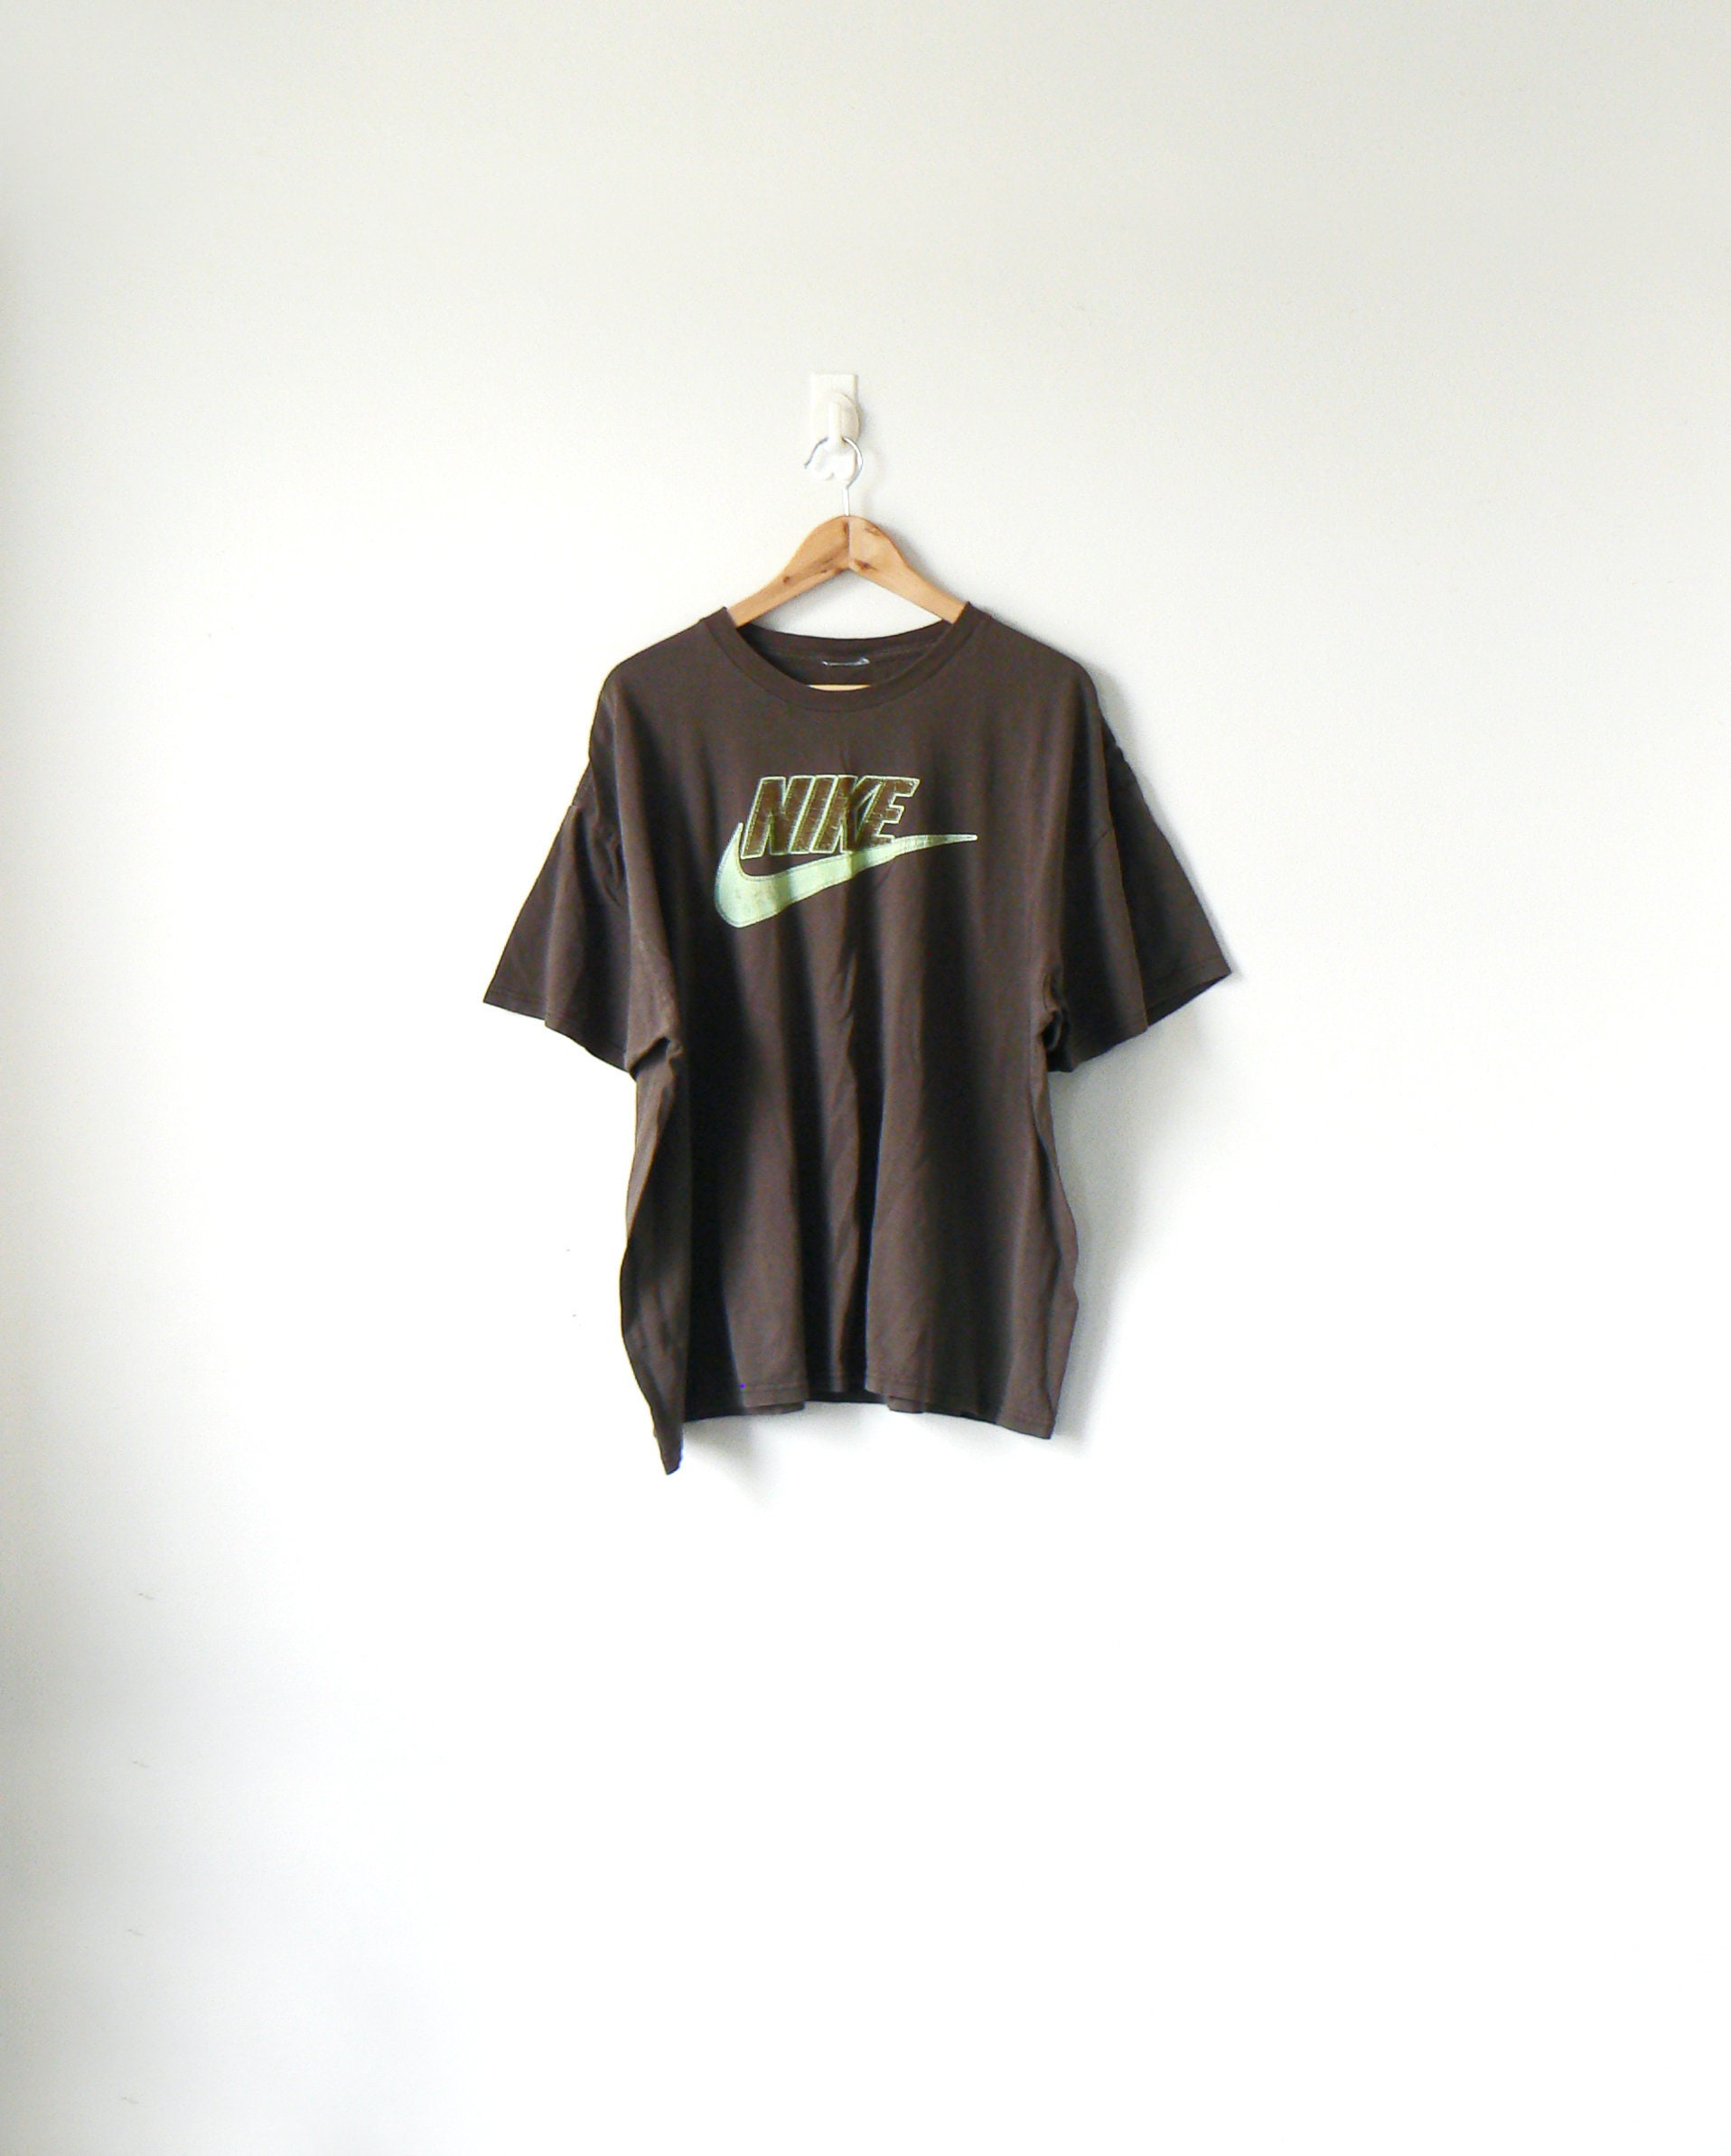 e4eef83f 90s Brown Nike T-Shirt Vintage Nike T-Shirt 90s T-Shirt | Etsy